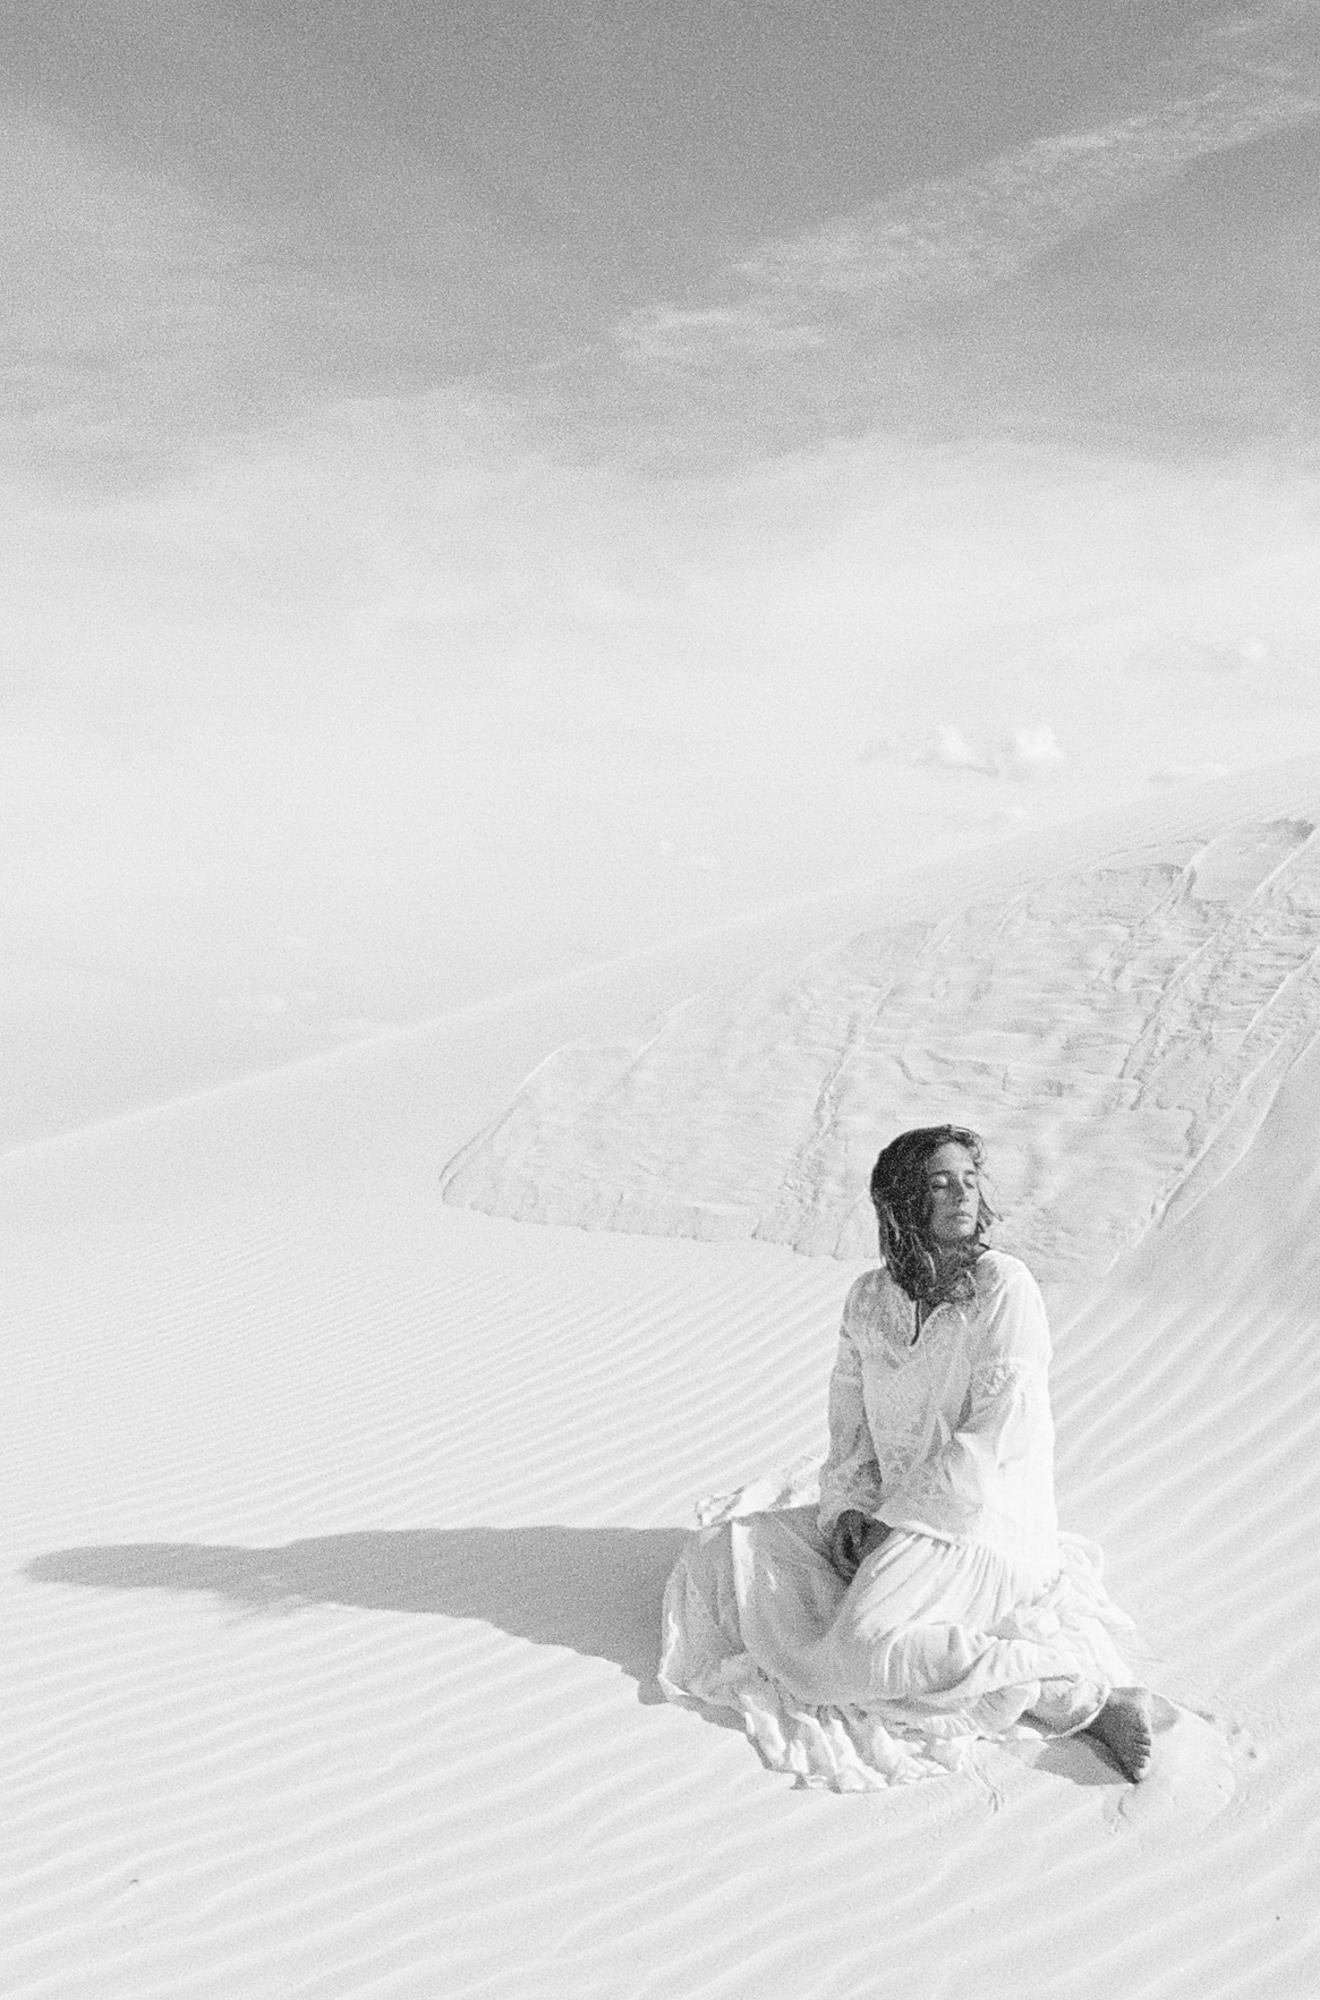 Profiles in Photography Morgane Erpicum